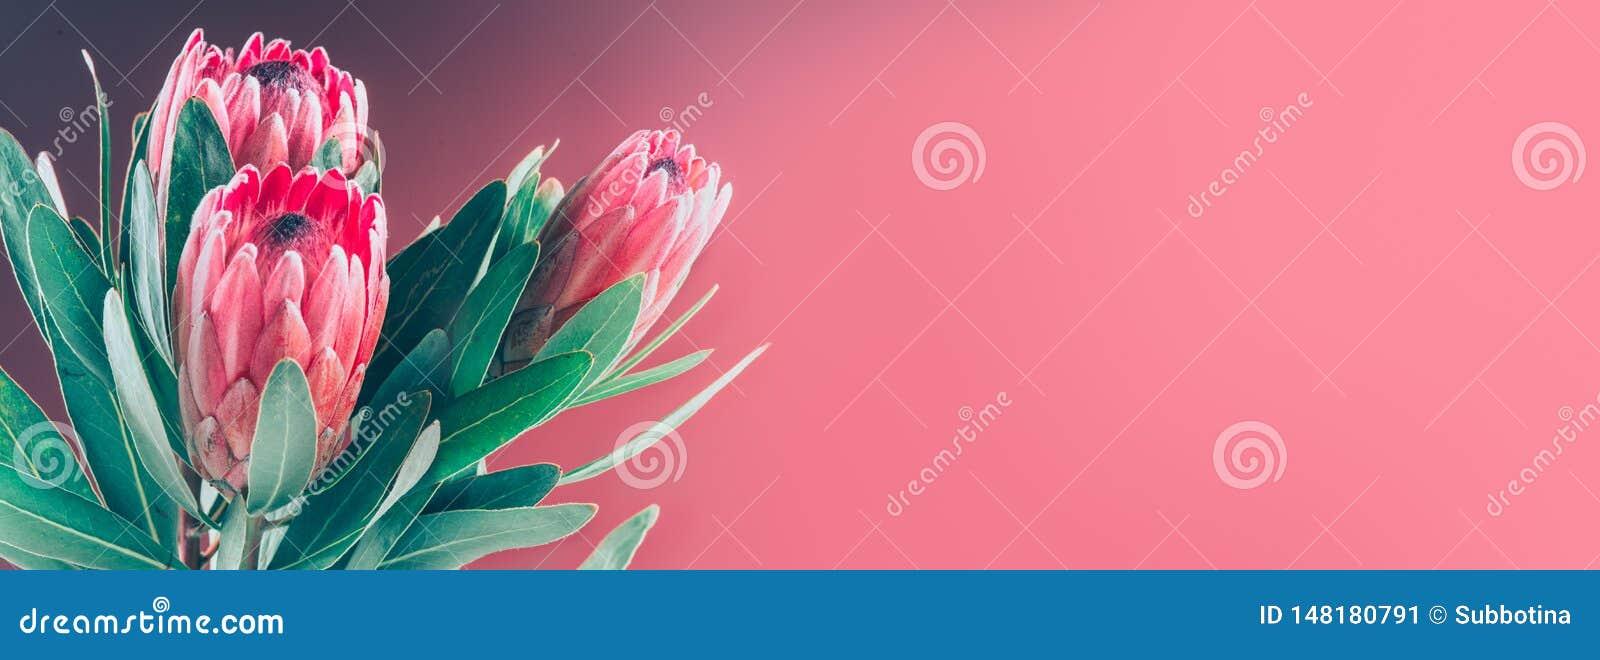 Proteaknoppcloseup Grupp av r?da blommor f?r konung Protea Bukett f?r dag f?r valentin` s Widescreen